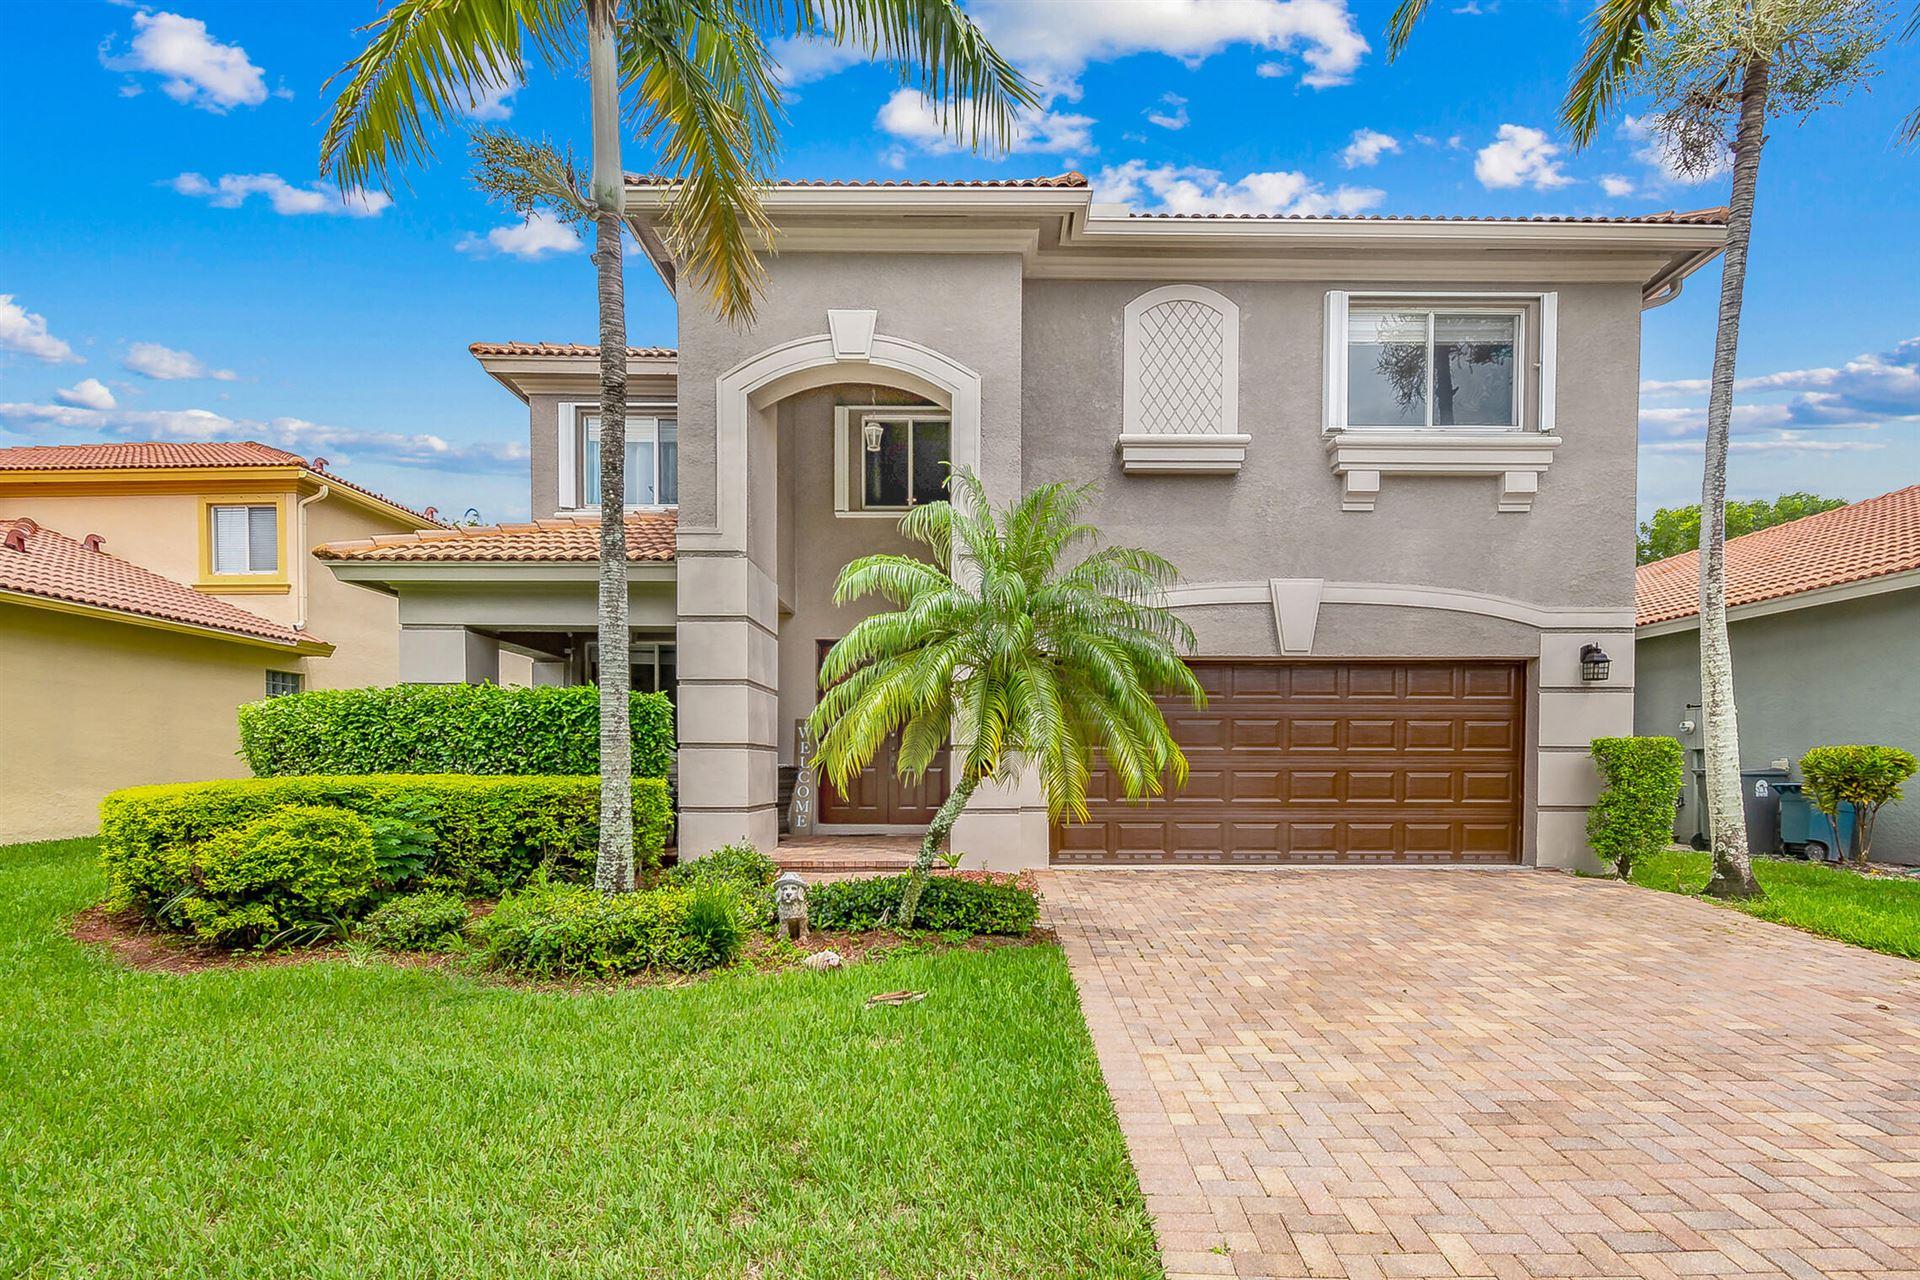 771 Gazetta Way, West Palm Beach, FL 33413 - MLS#: RX-10736566